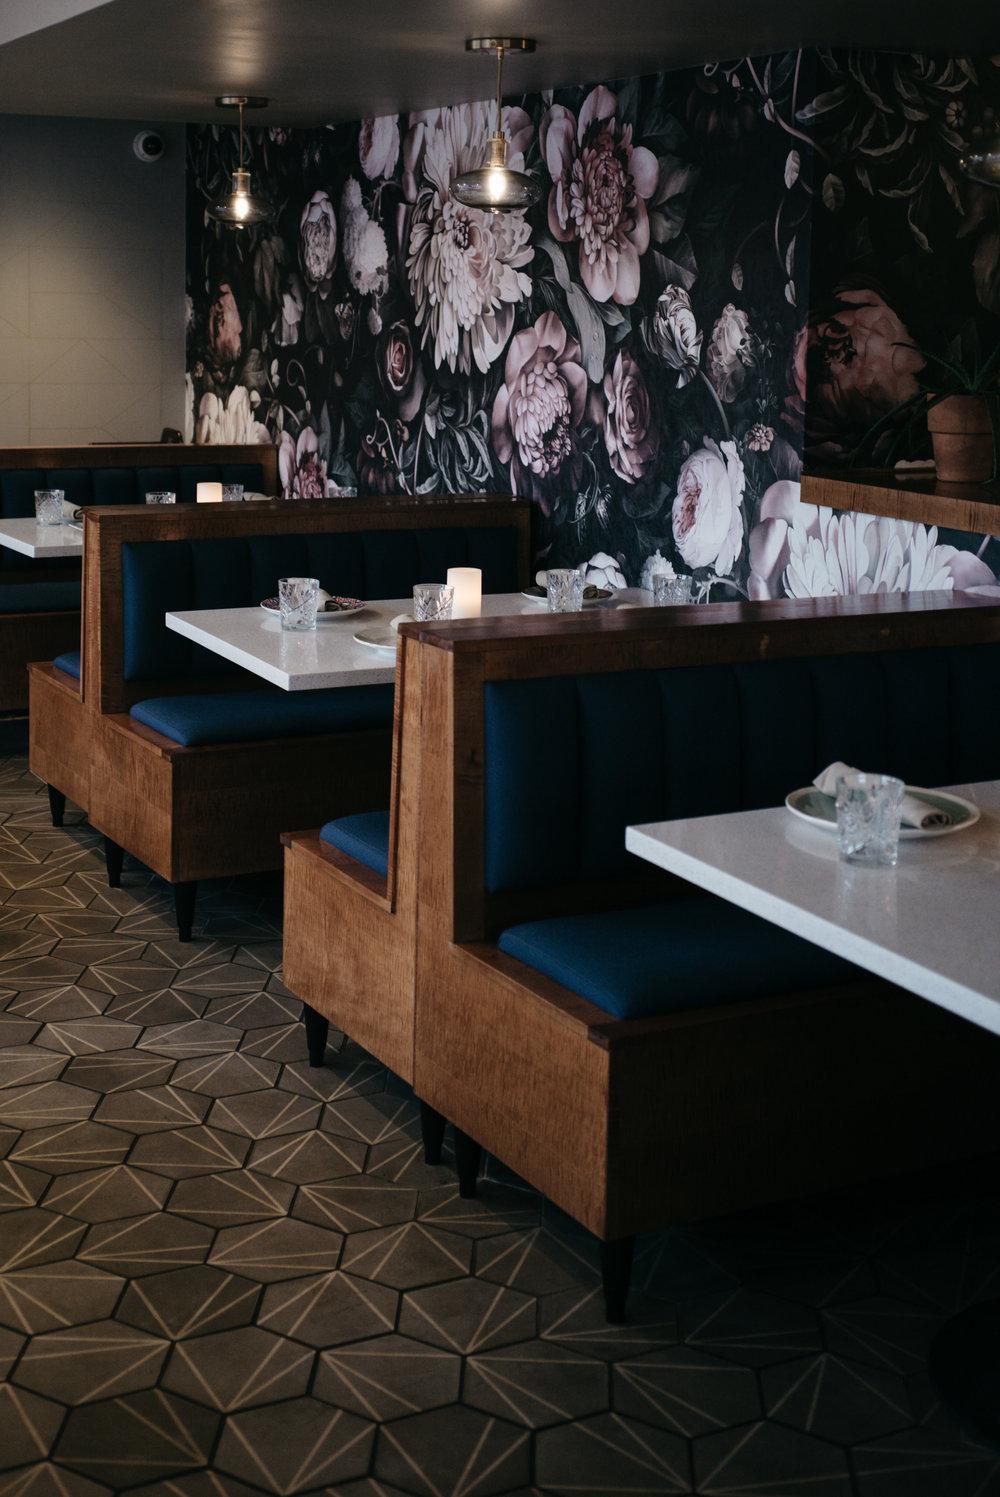 12th-Table-WEDDING-RENTALS-NASHVILLE-Design-Tips-Stock-Photos-Mockingbird-Nashville12.jpg